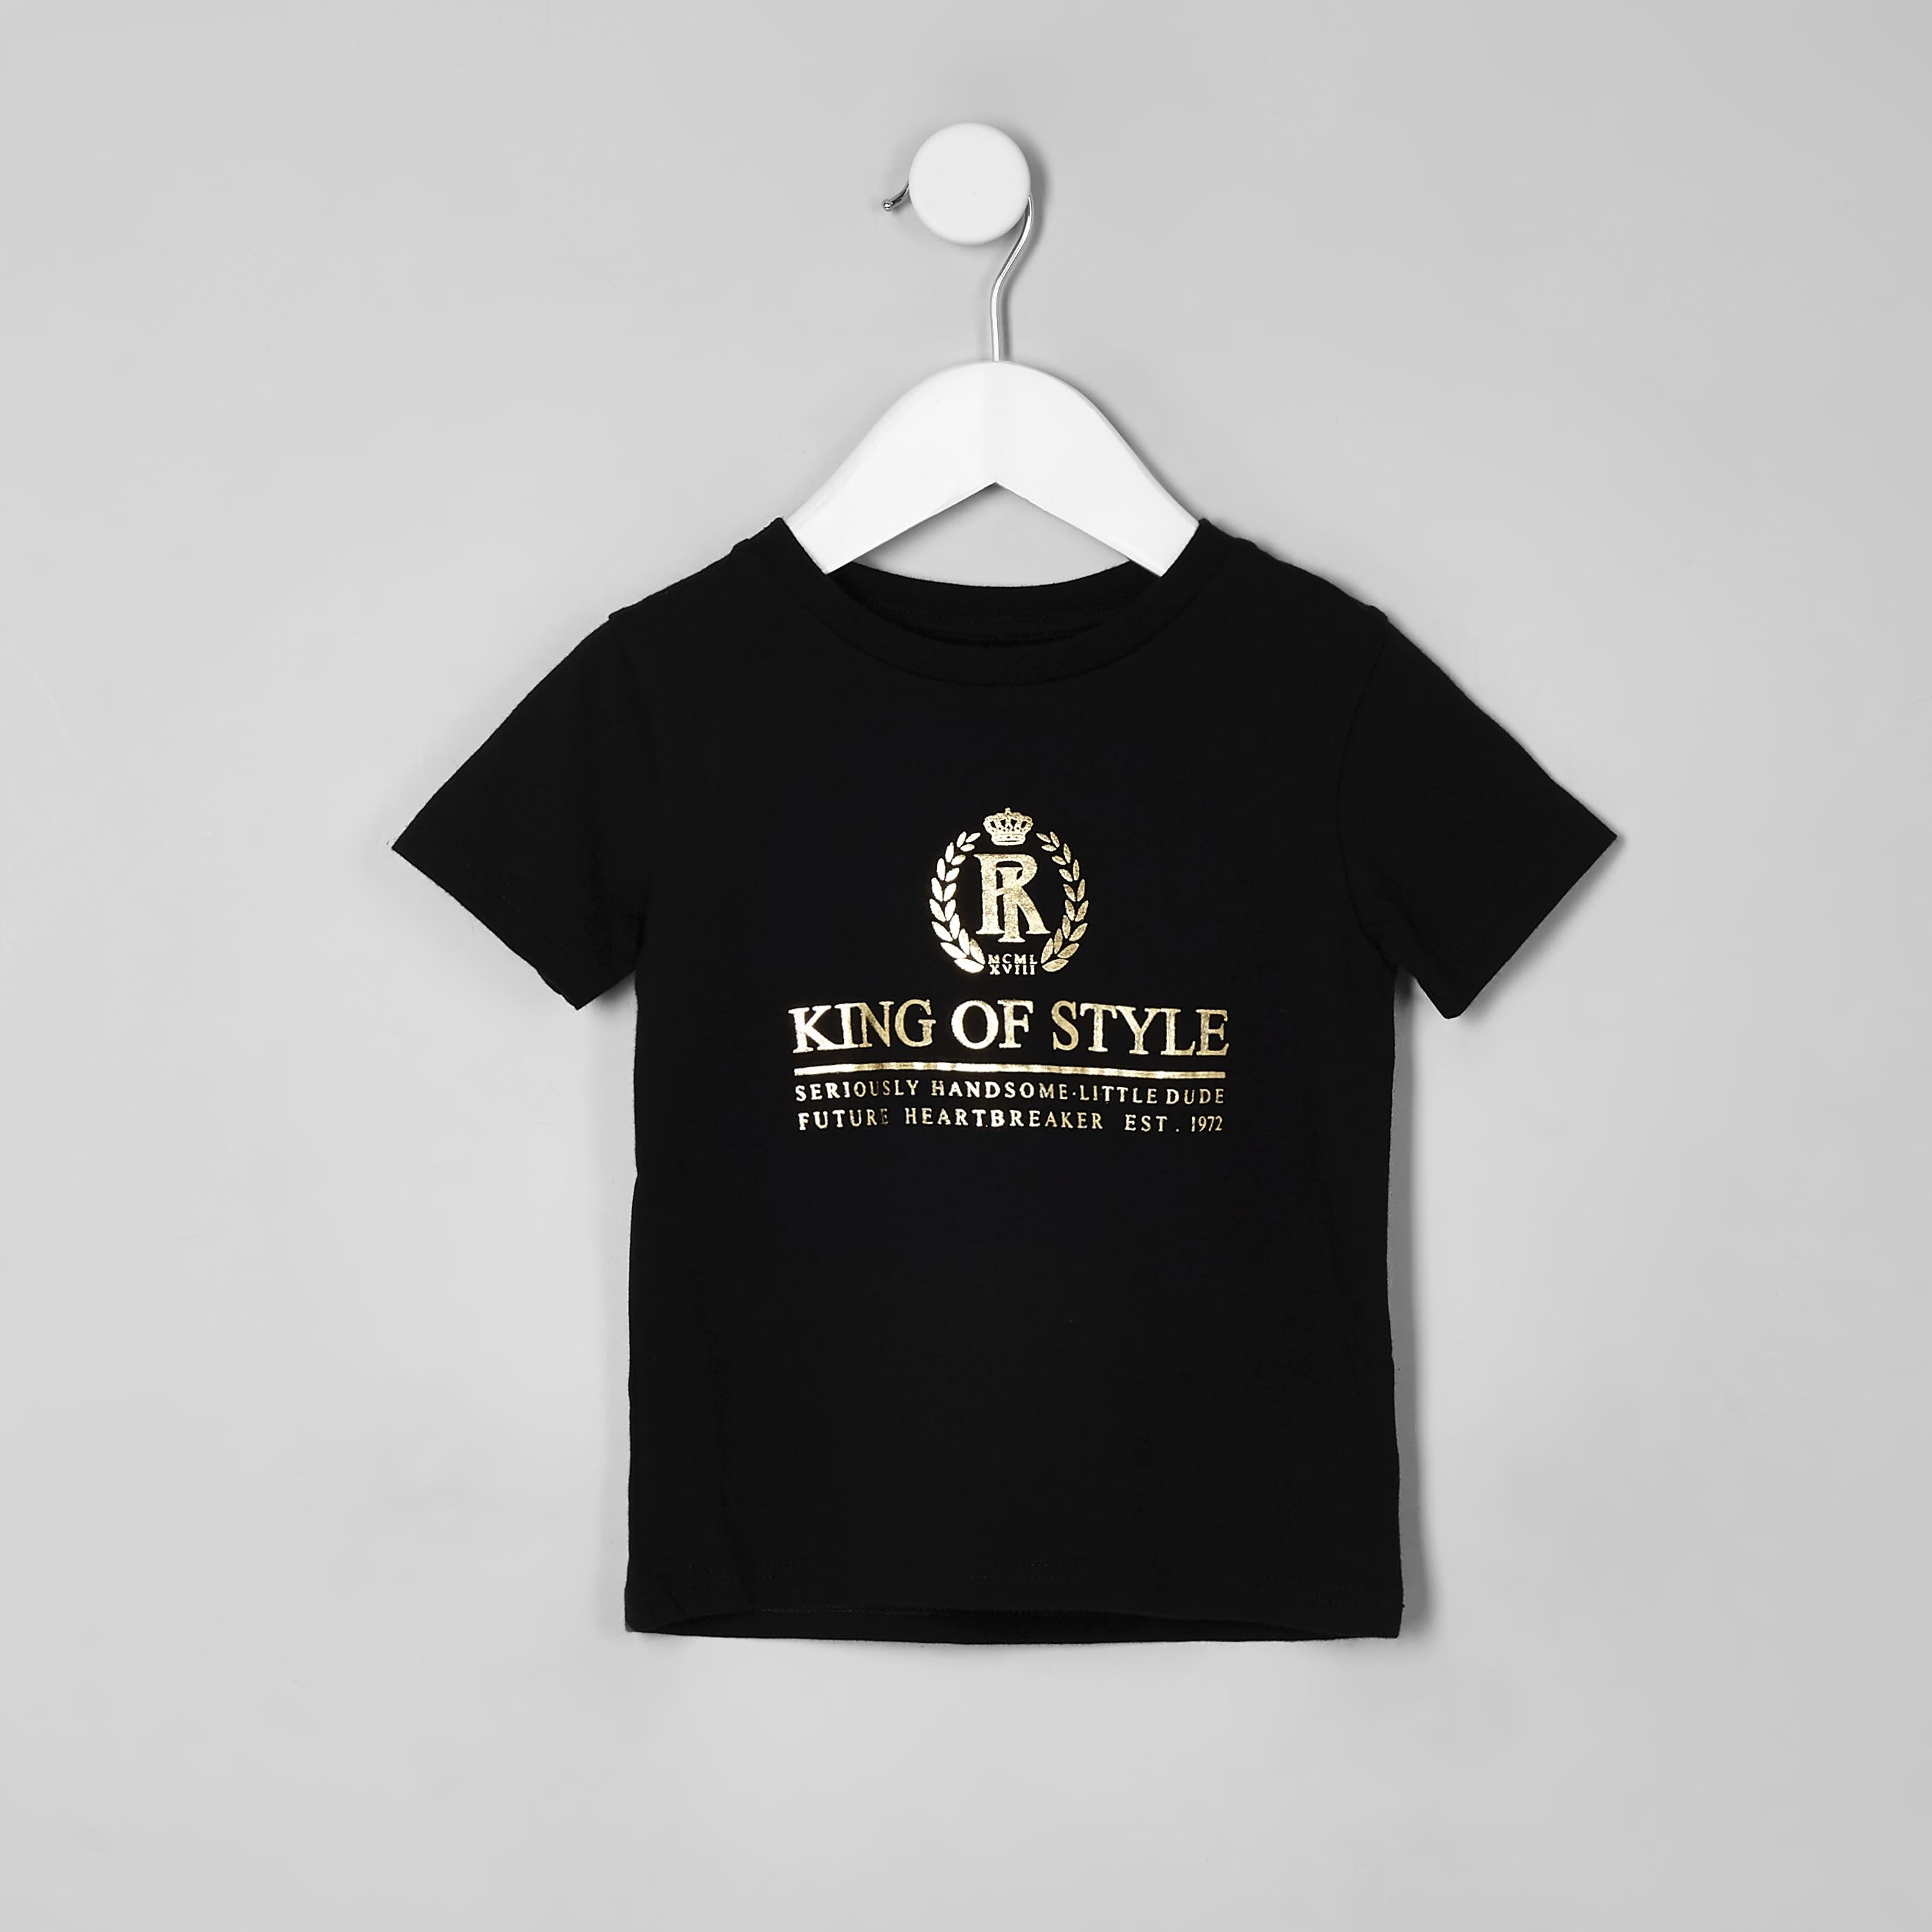 River Island Mens Baby Boys Black 'King of style' T-shirt (0-3 Mths)